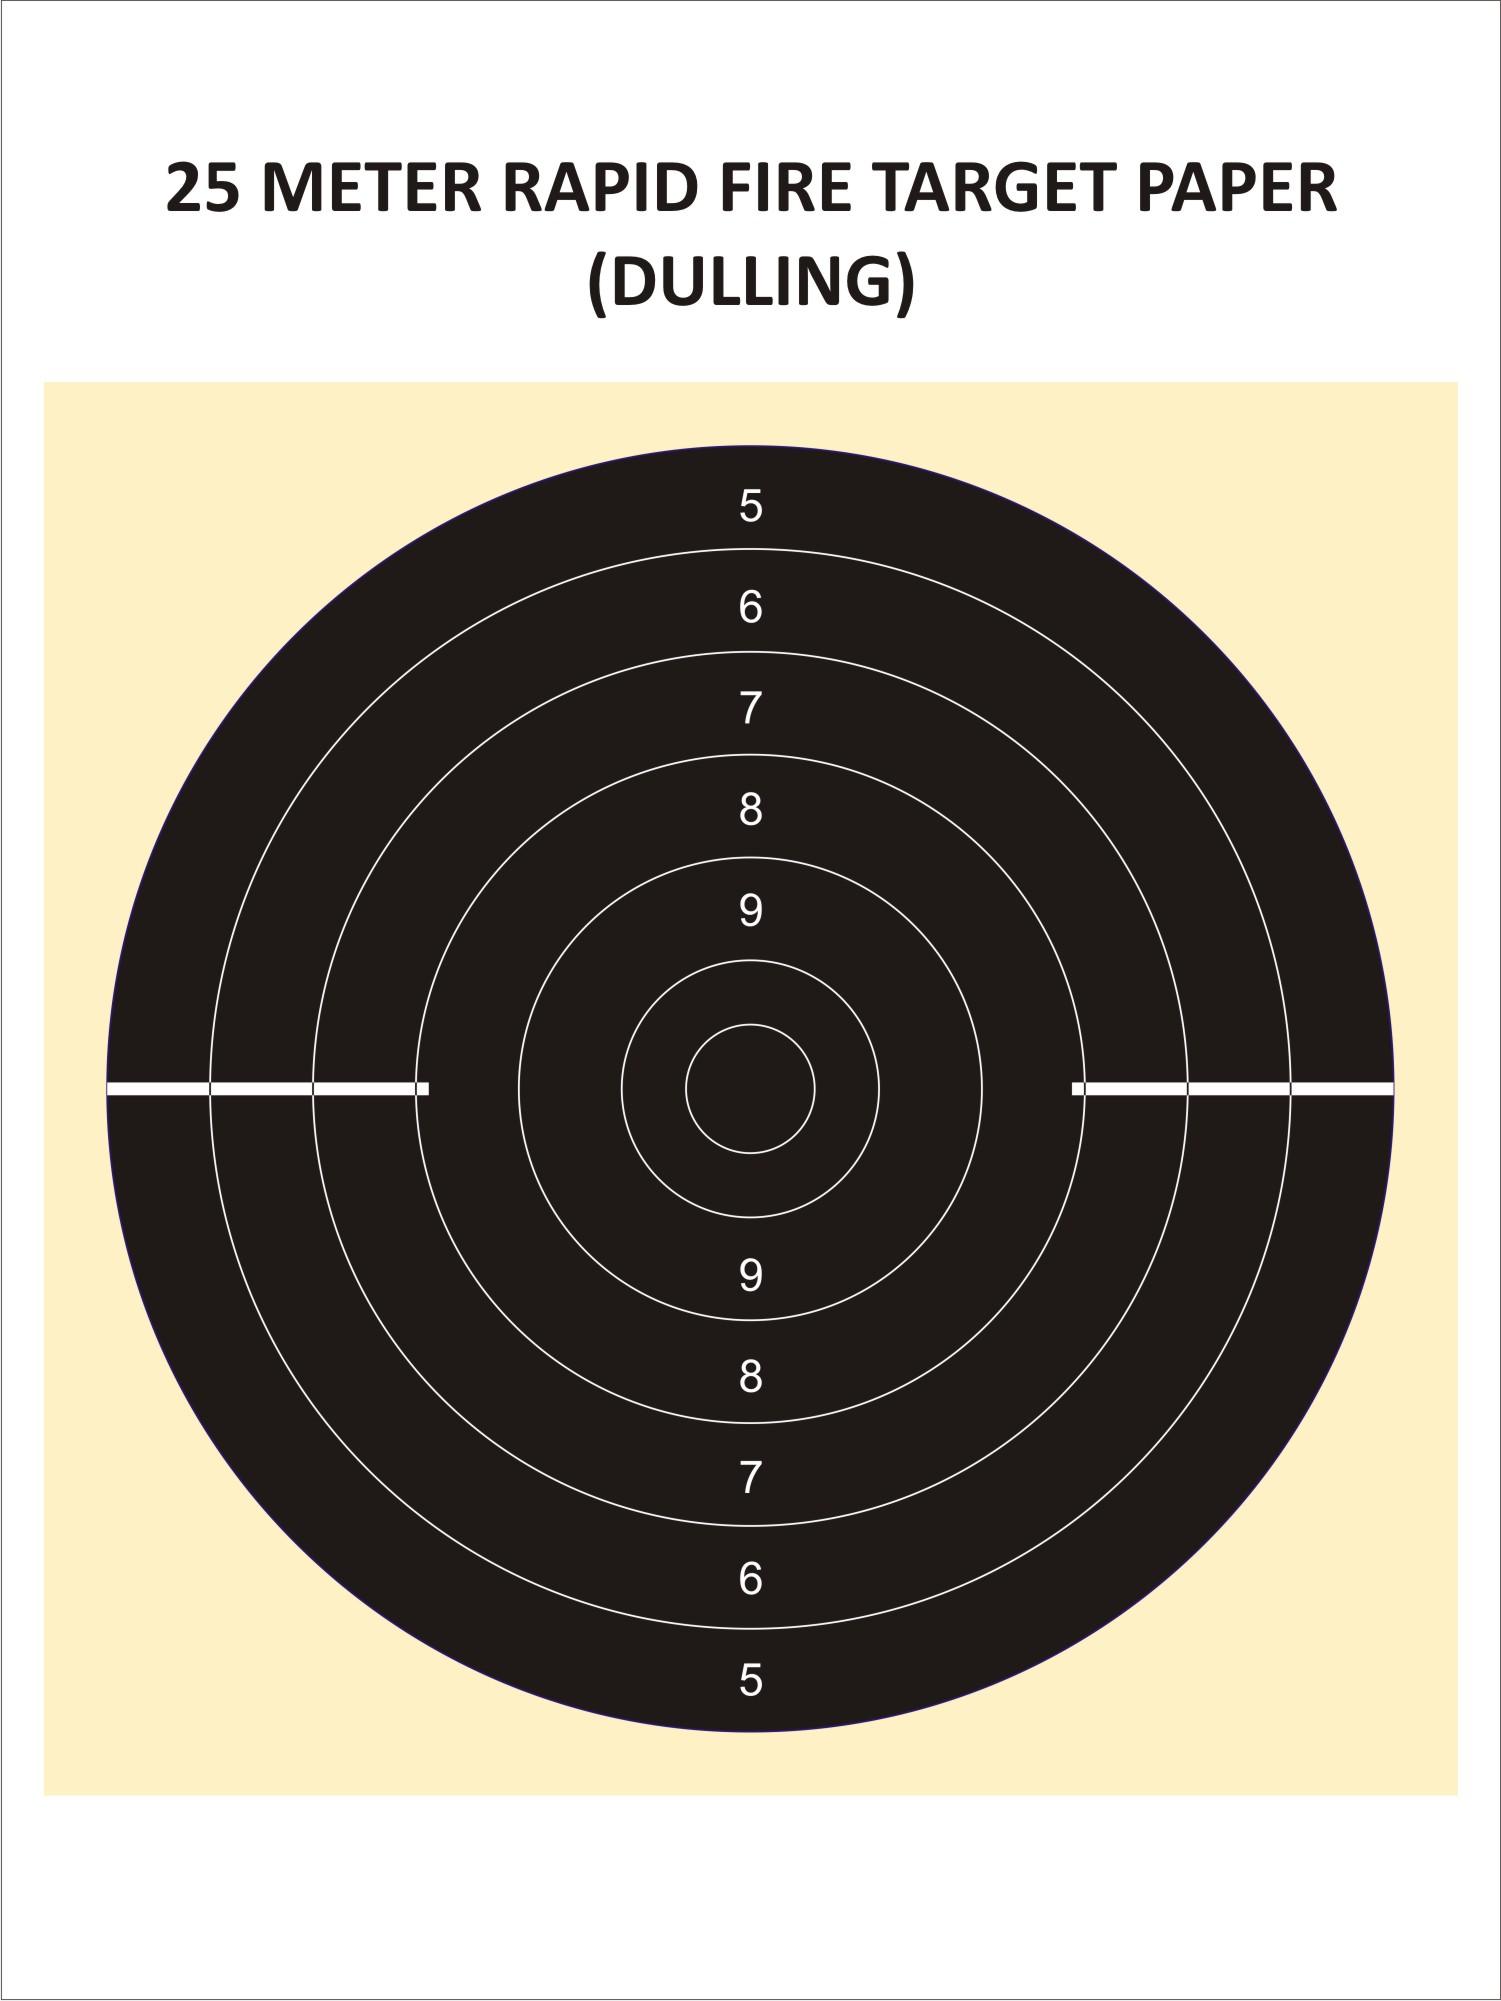 Rapid Fire Dulling Target (25 Metres)